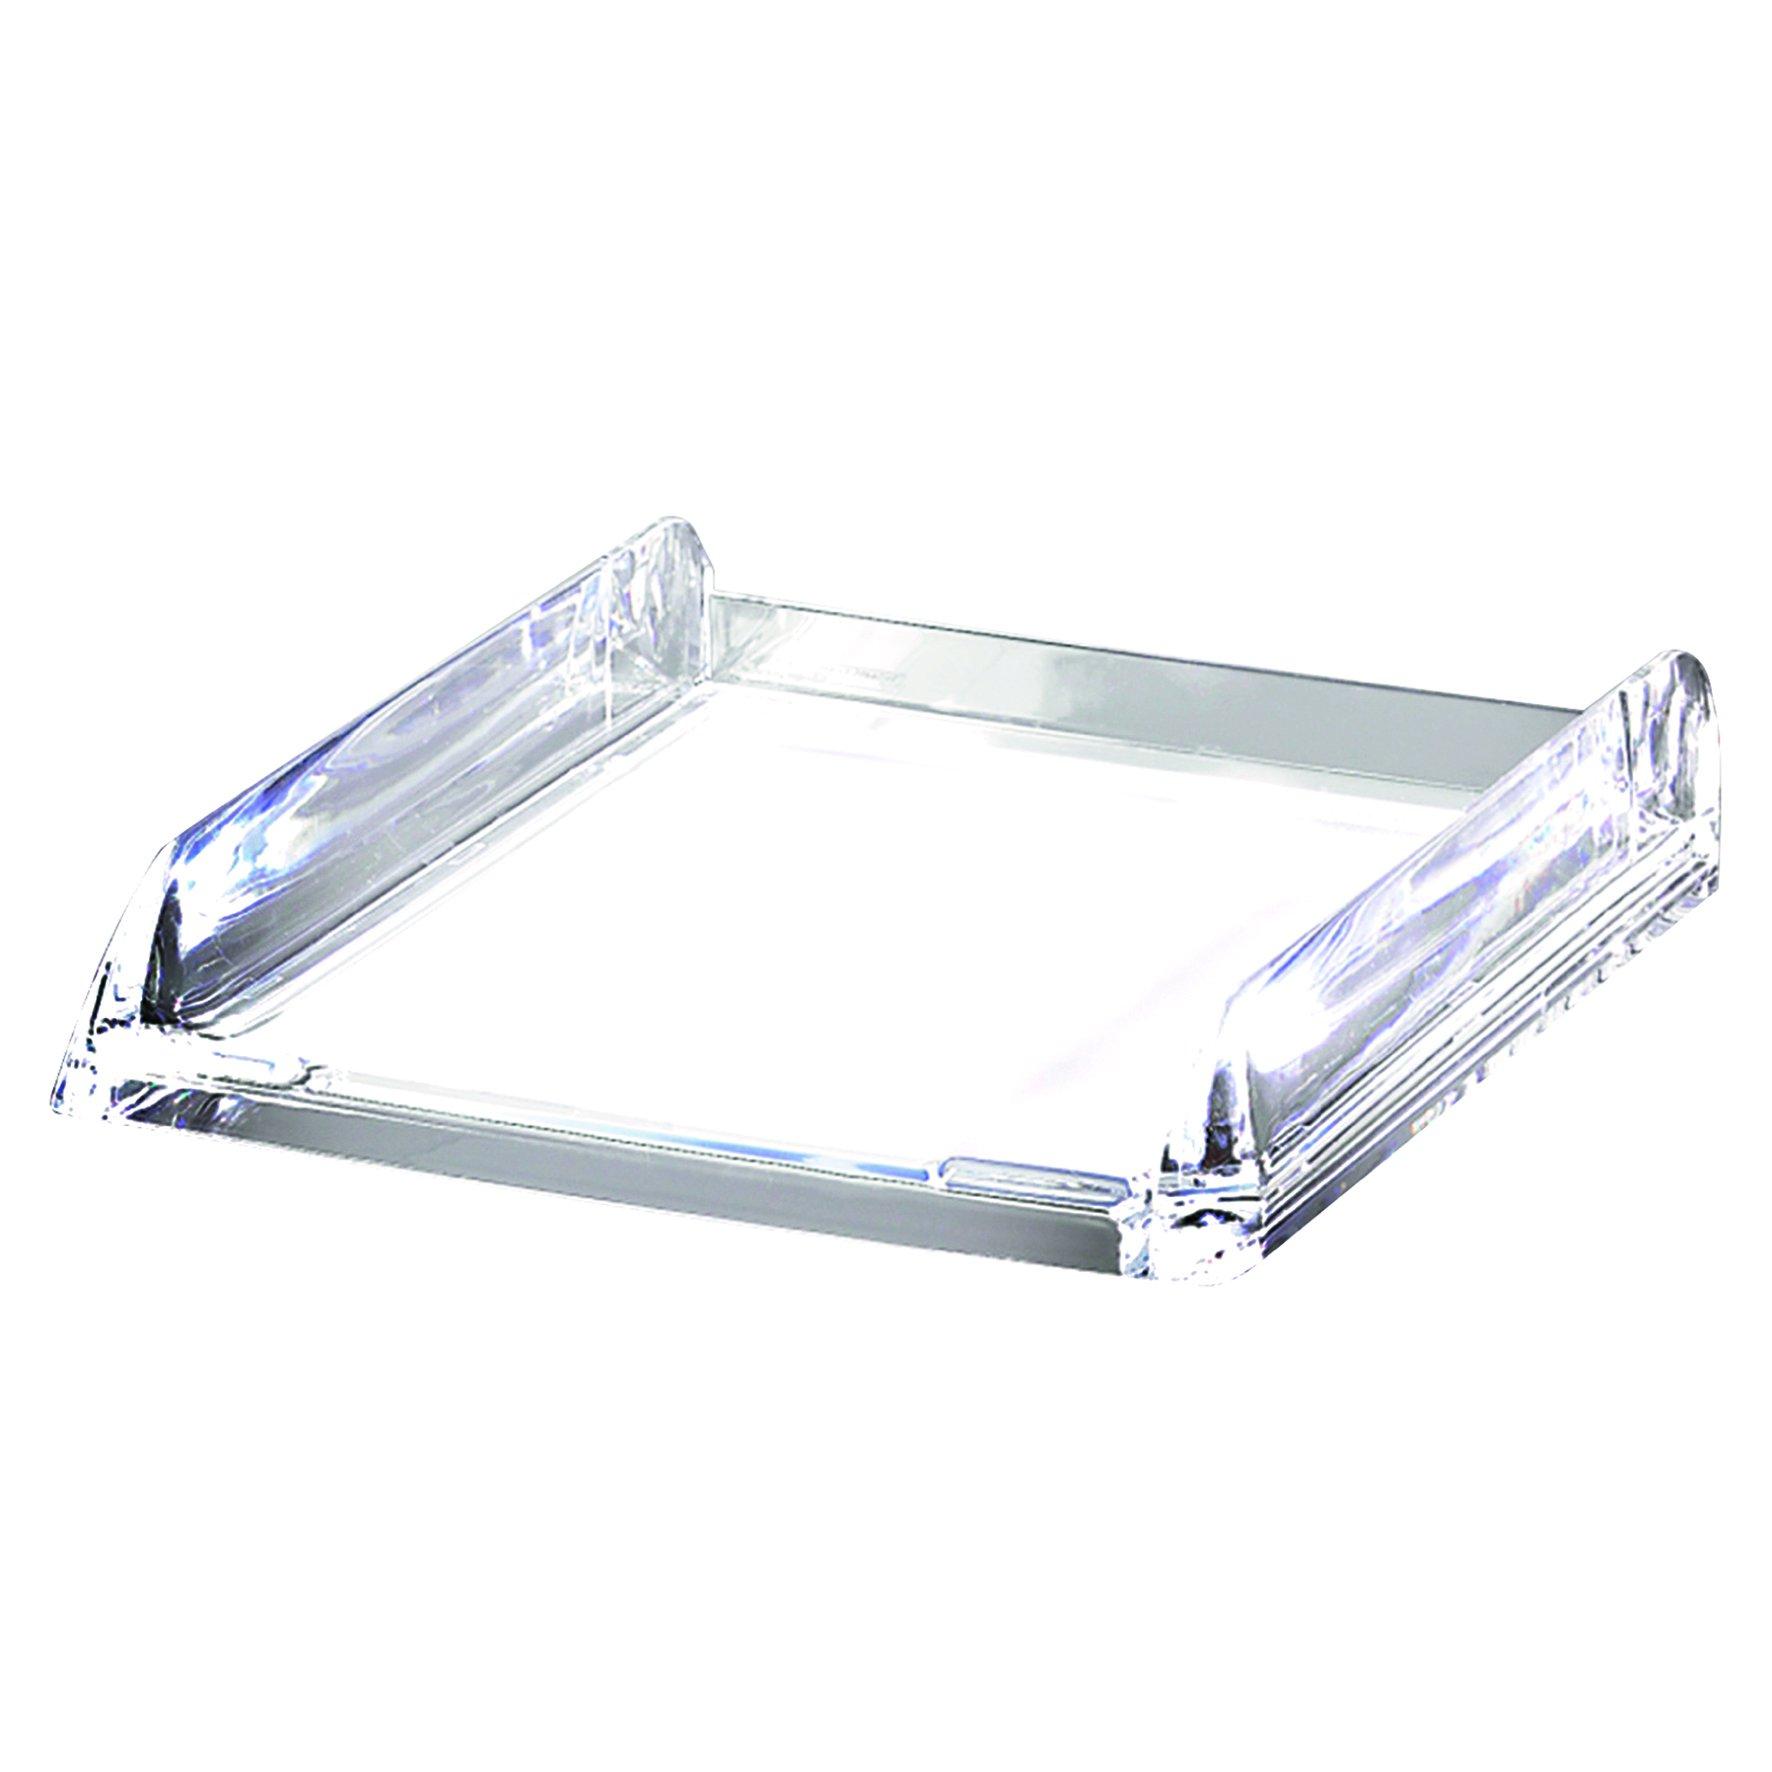 Rexel Nimbus Letter Tray Clear 2101504